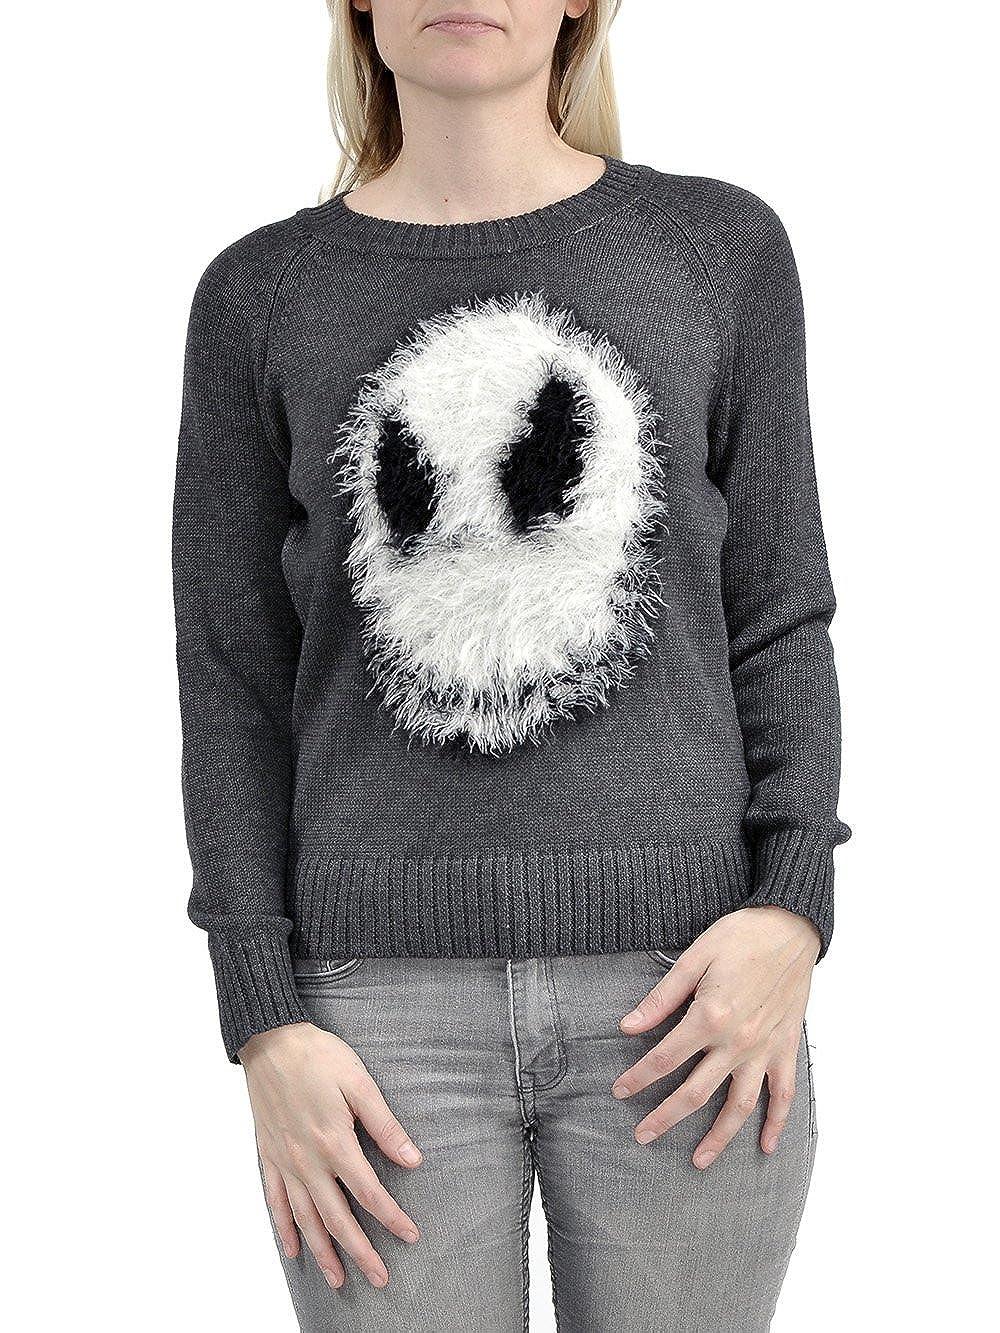 Nightmare Before Christmas Fuzzy Jack Skellington Junior's Knit Sweater, Medium Kryptonite